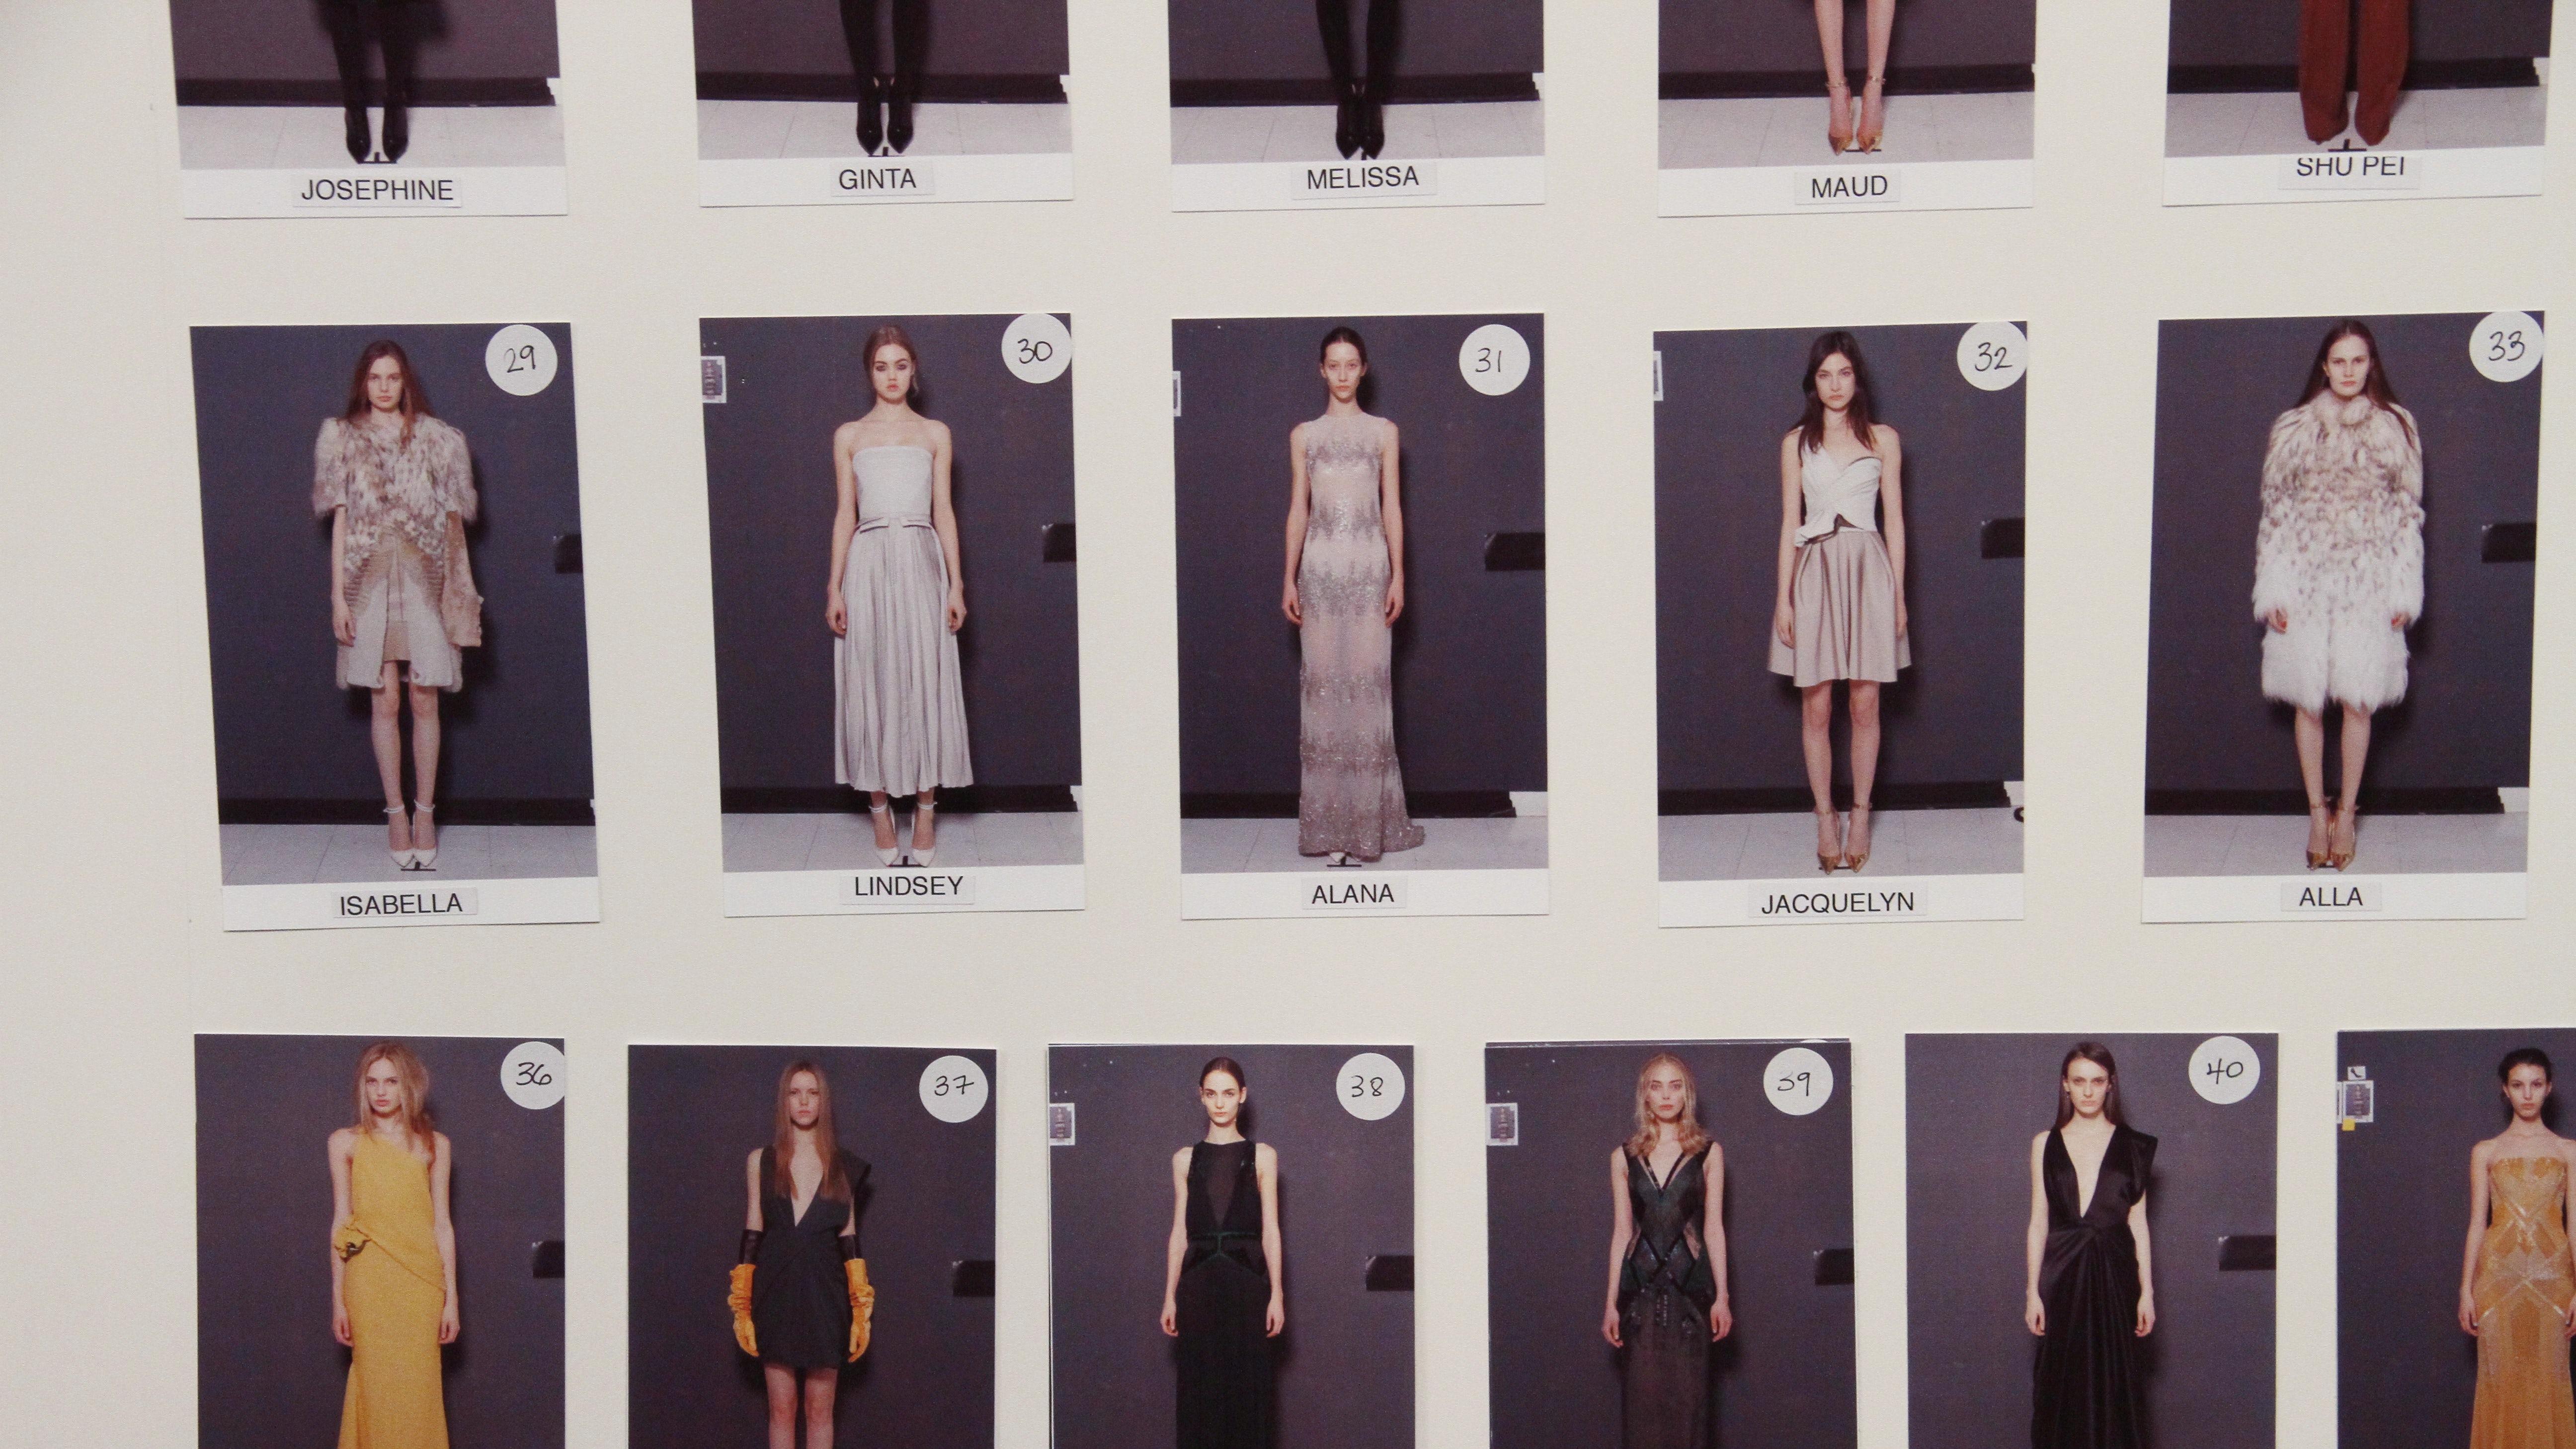 Social Goods | Modelling Agencies Enabled Sexual Predators, Zara Appropriated Indian Garments